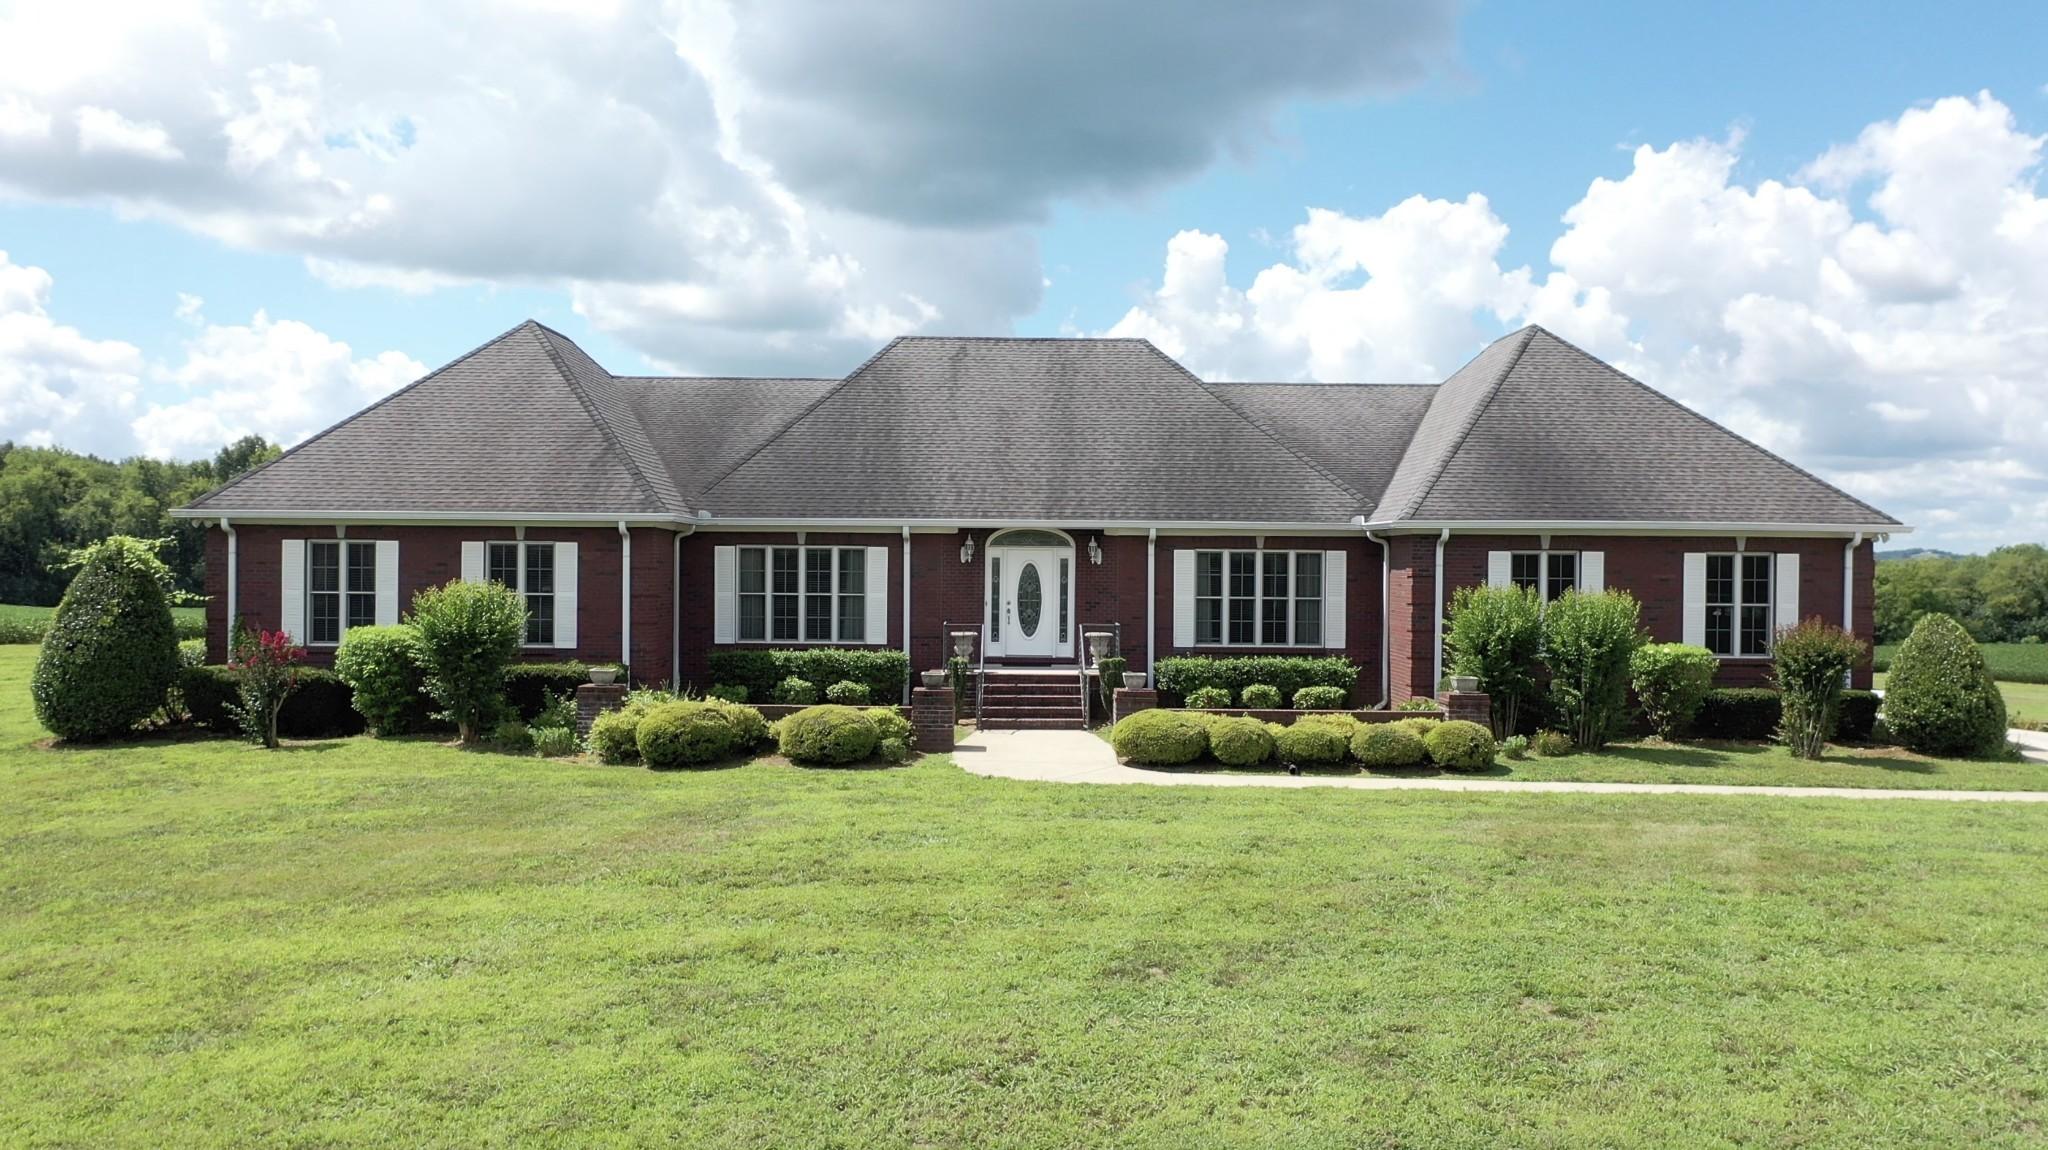 268 Clanton Ln Property Photo - Wartrace, TN real estate listing